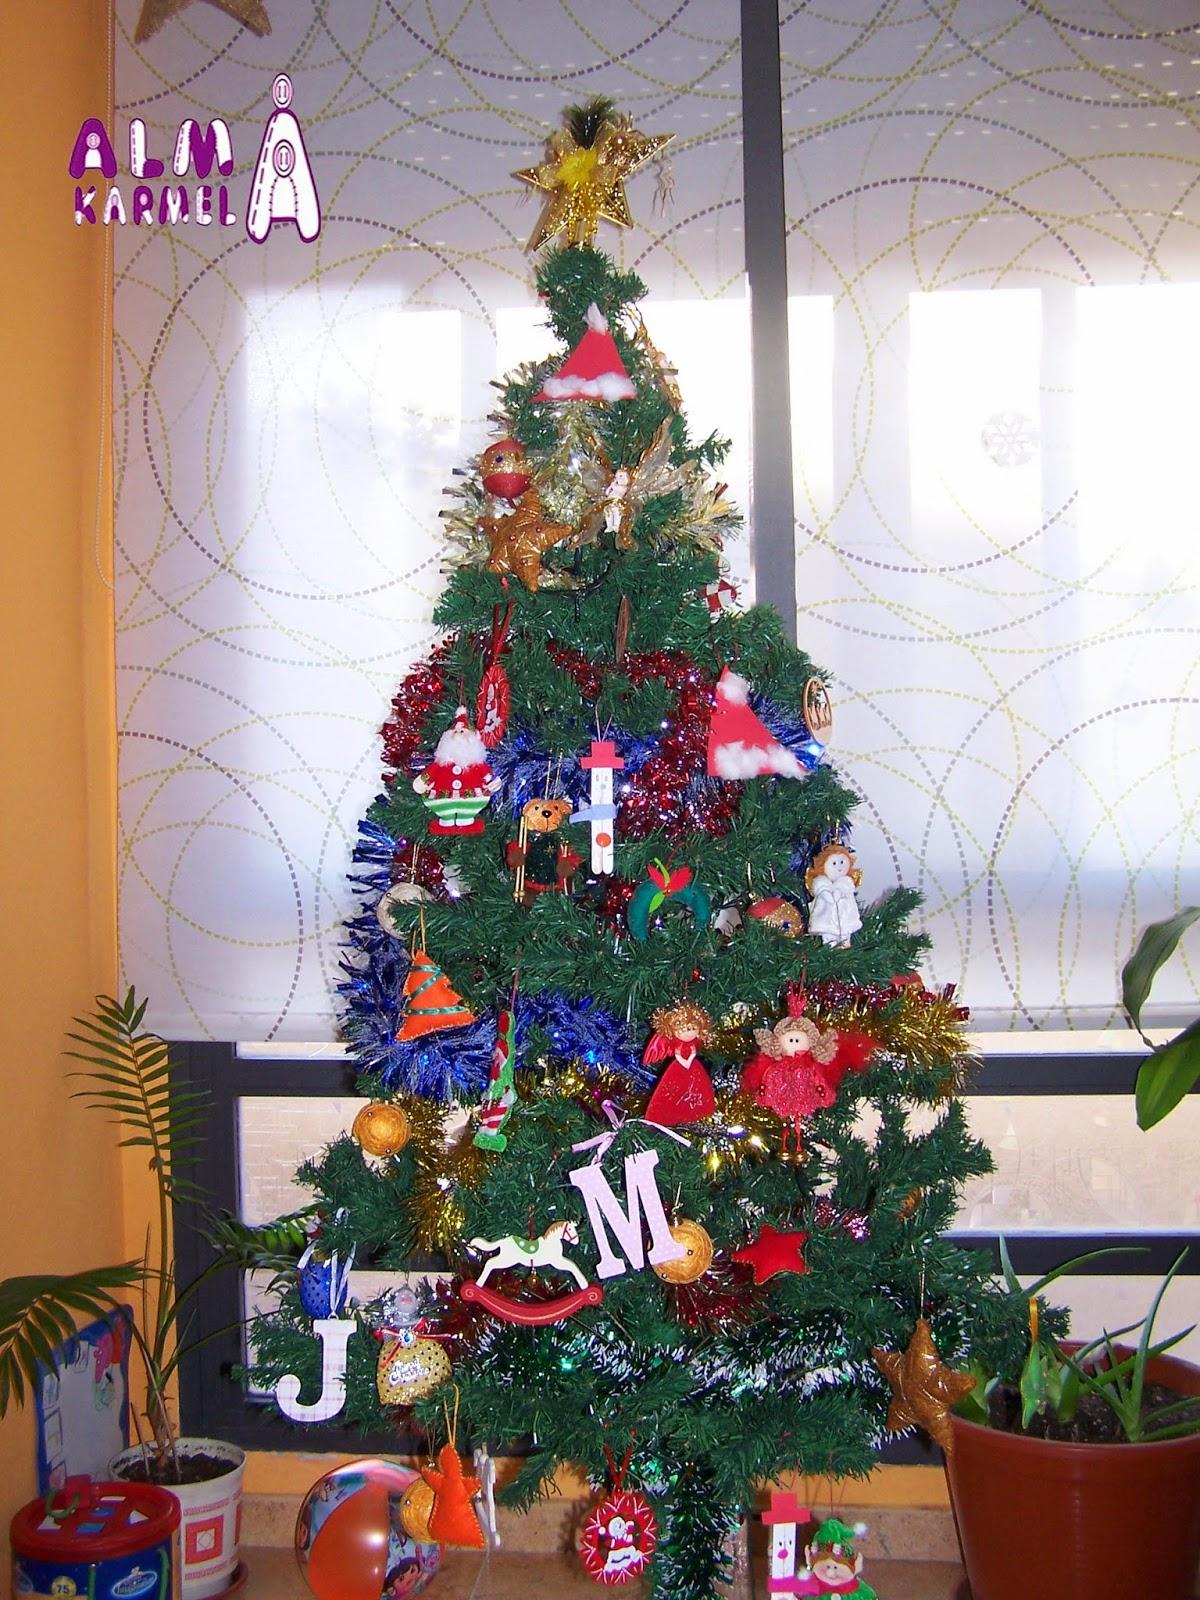 Almakarmela nuestra decoraci n navide a parte ii - Decoracion navidena 2014 ...